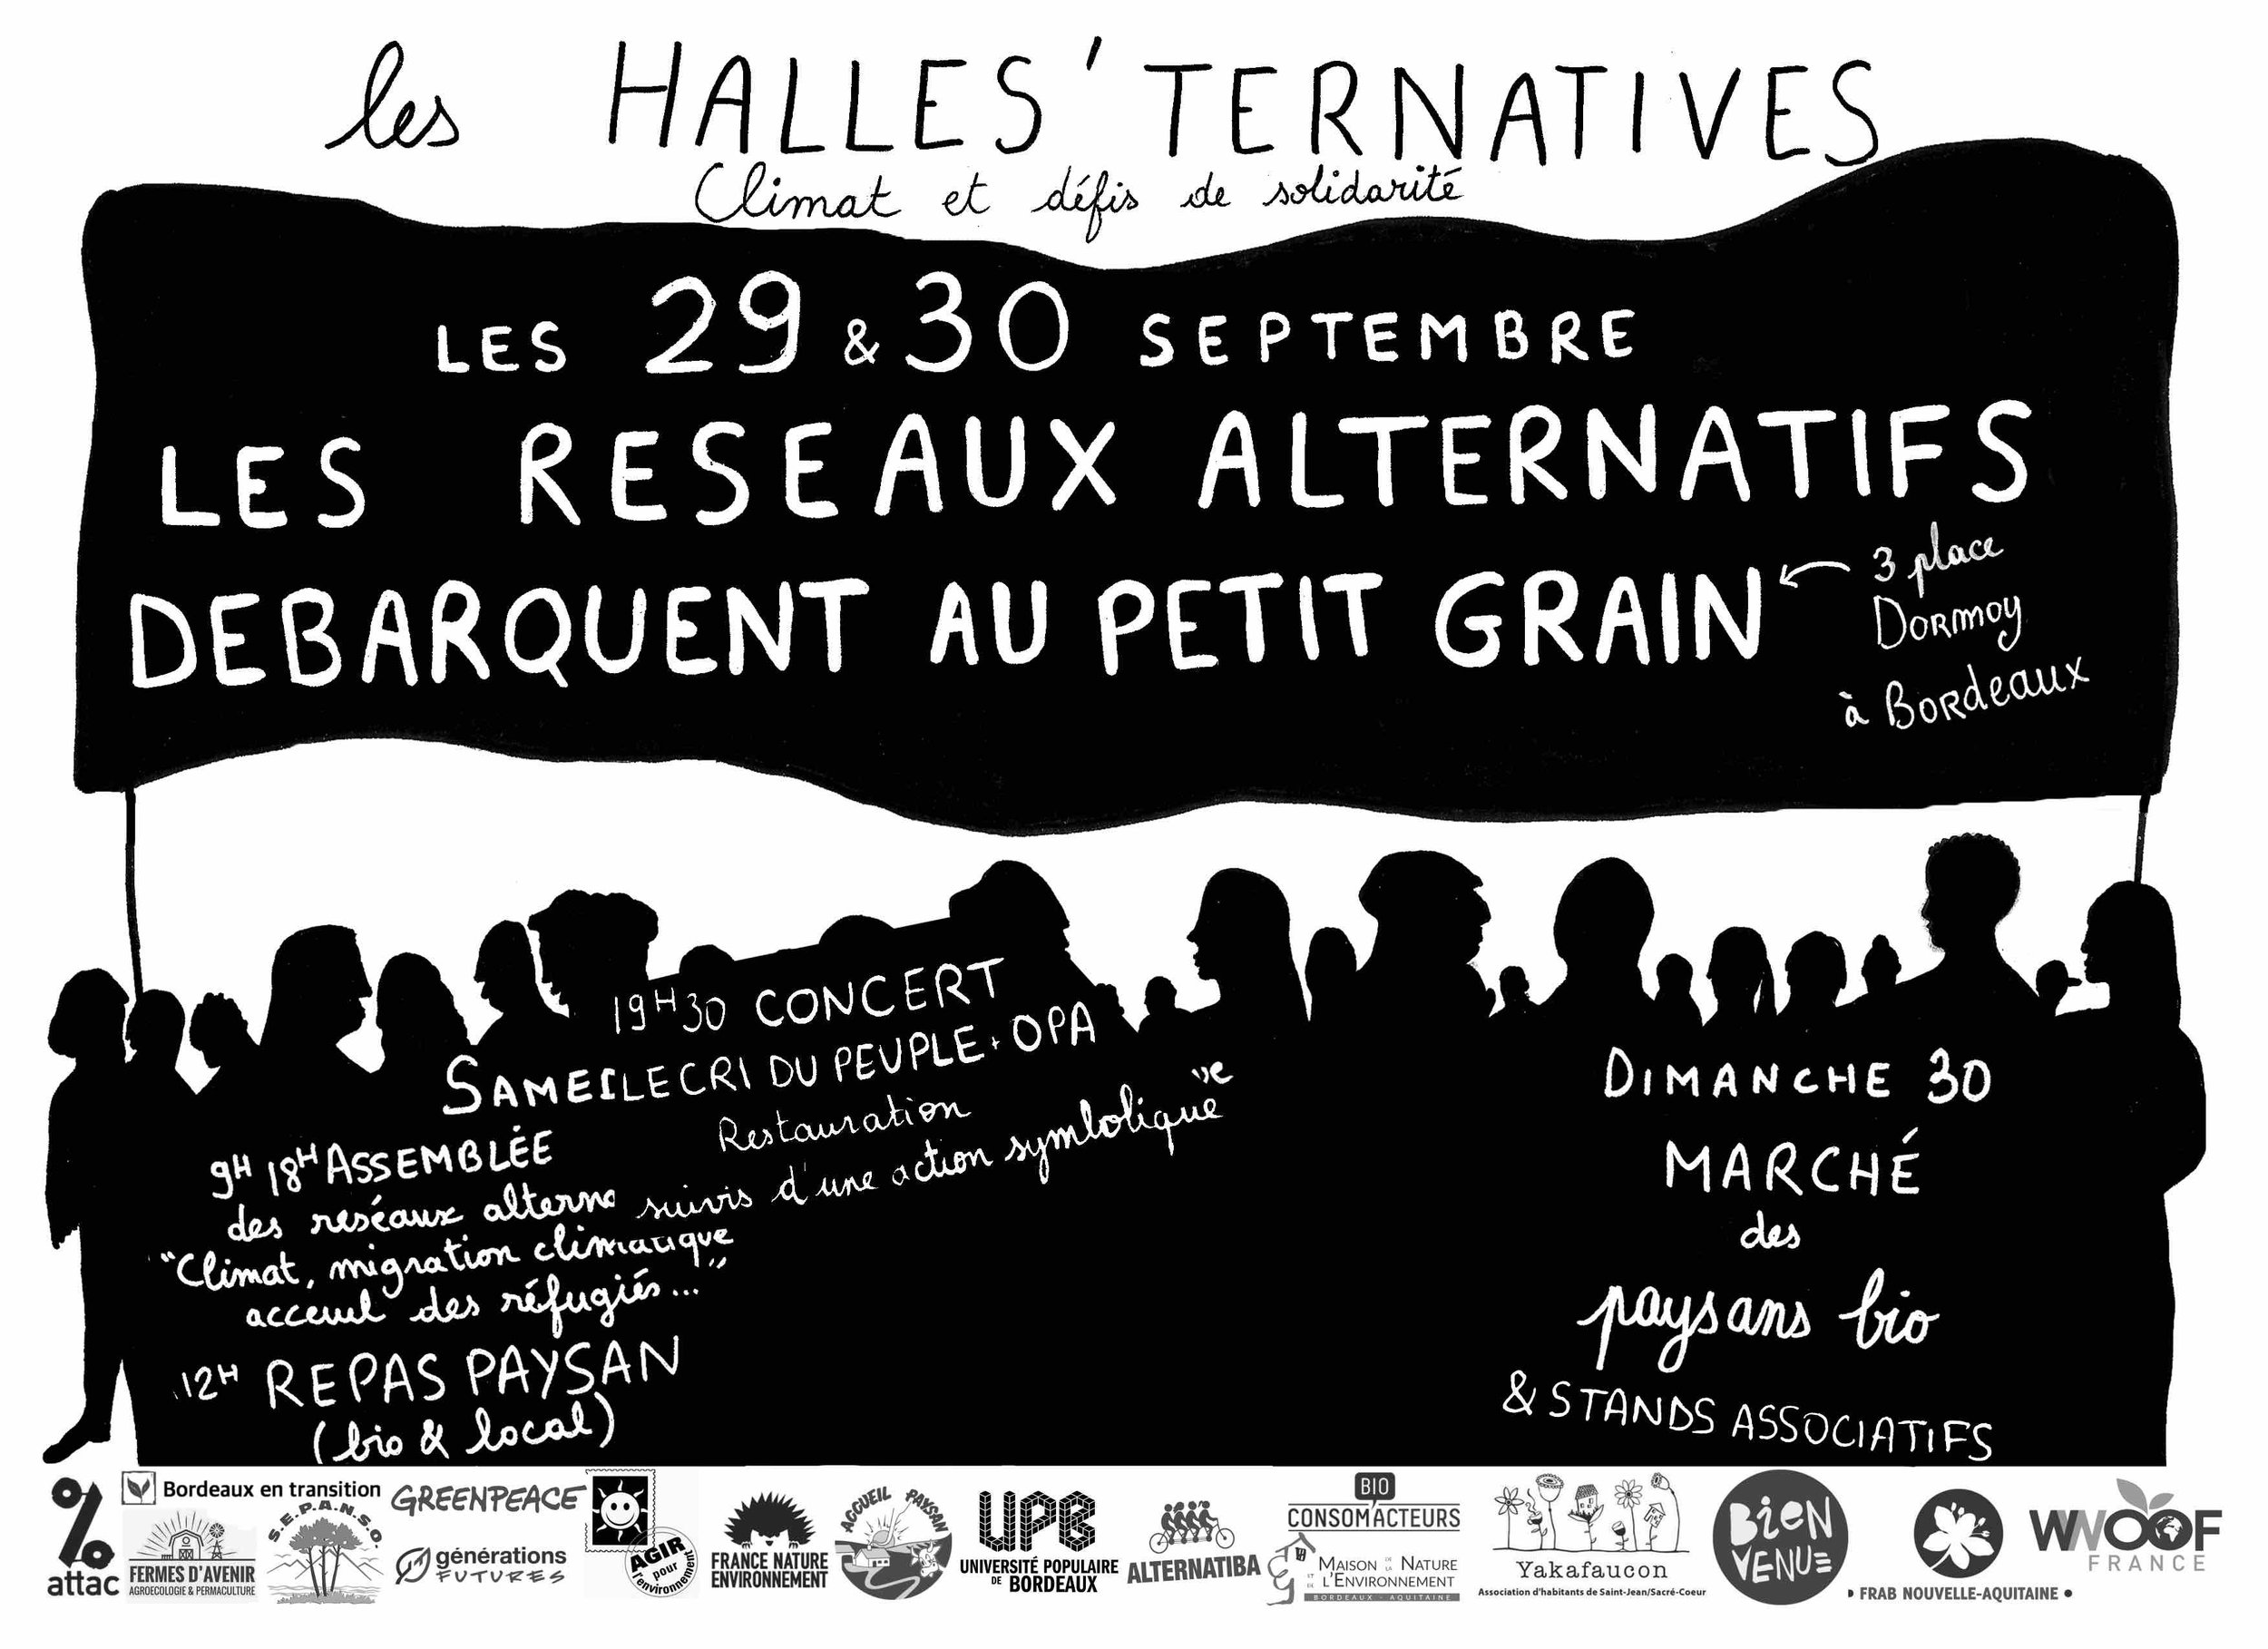 affiche-halles-ternatives4.jpg